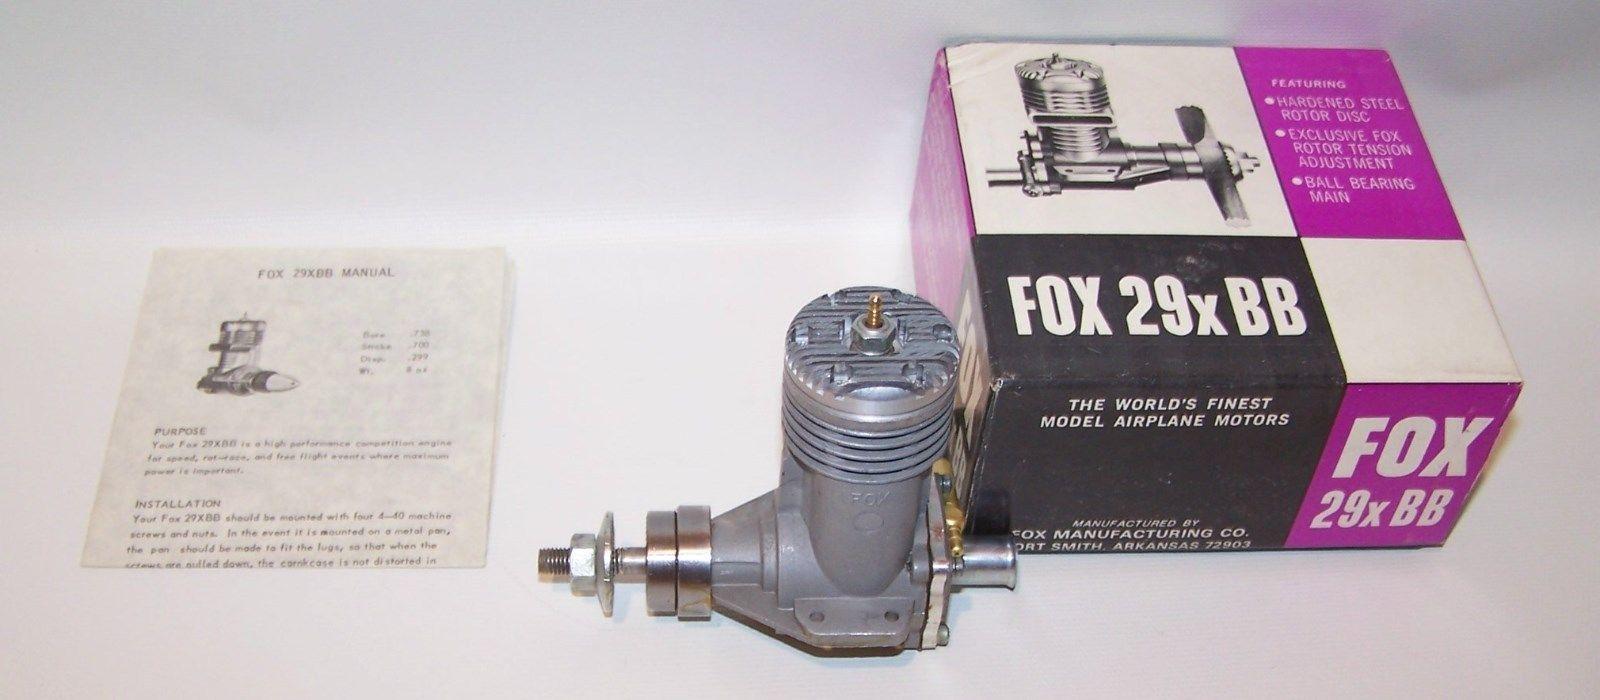 http://www.ebay.com.au/itm/New-1965-Fox-29X-BB-RV-Control-Line ...